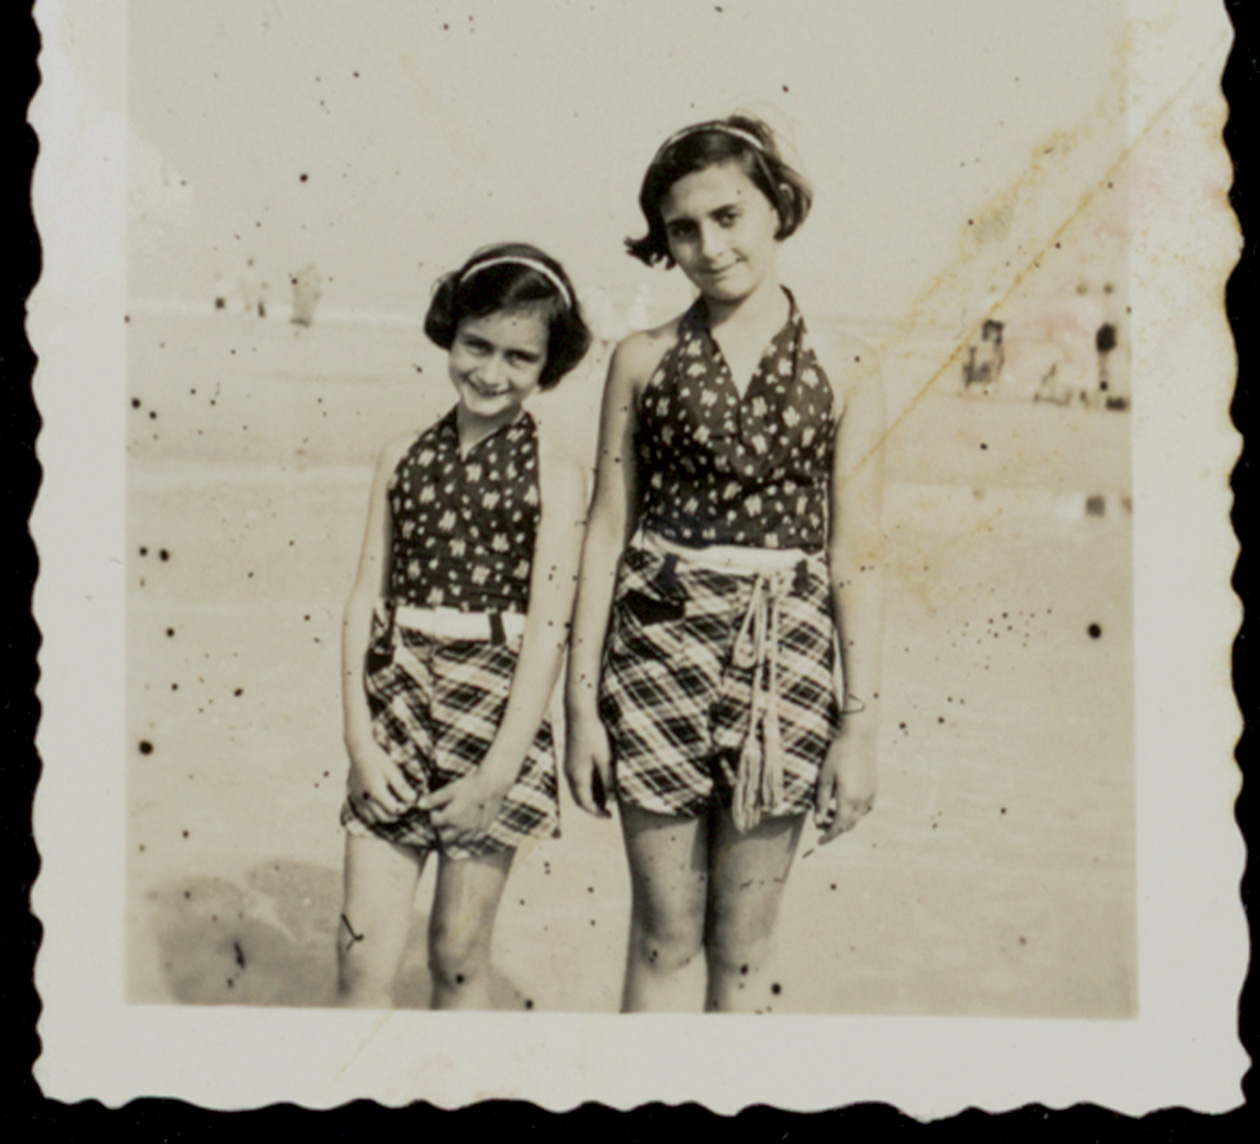 Anne Frank Diary Pattern